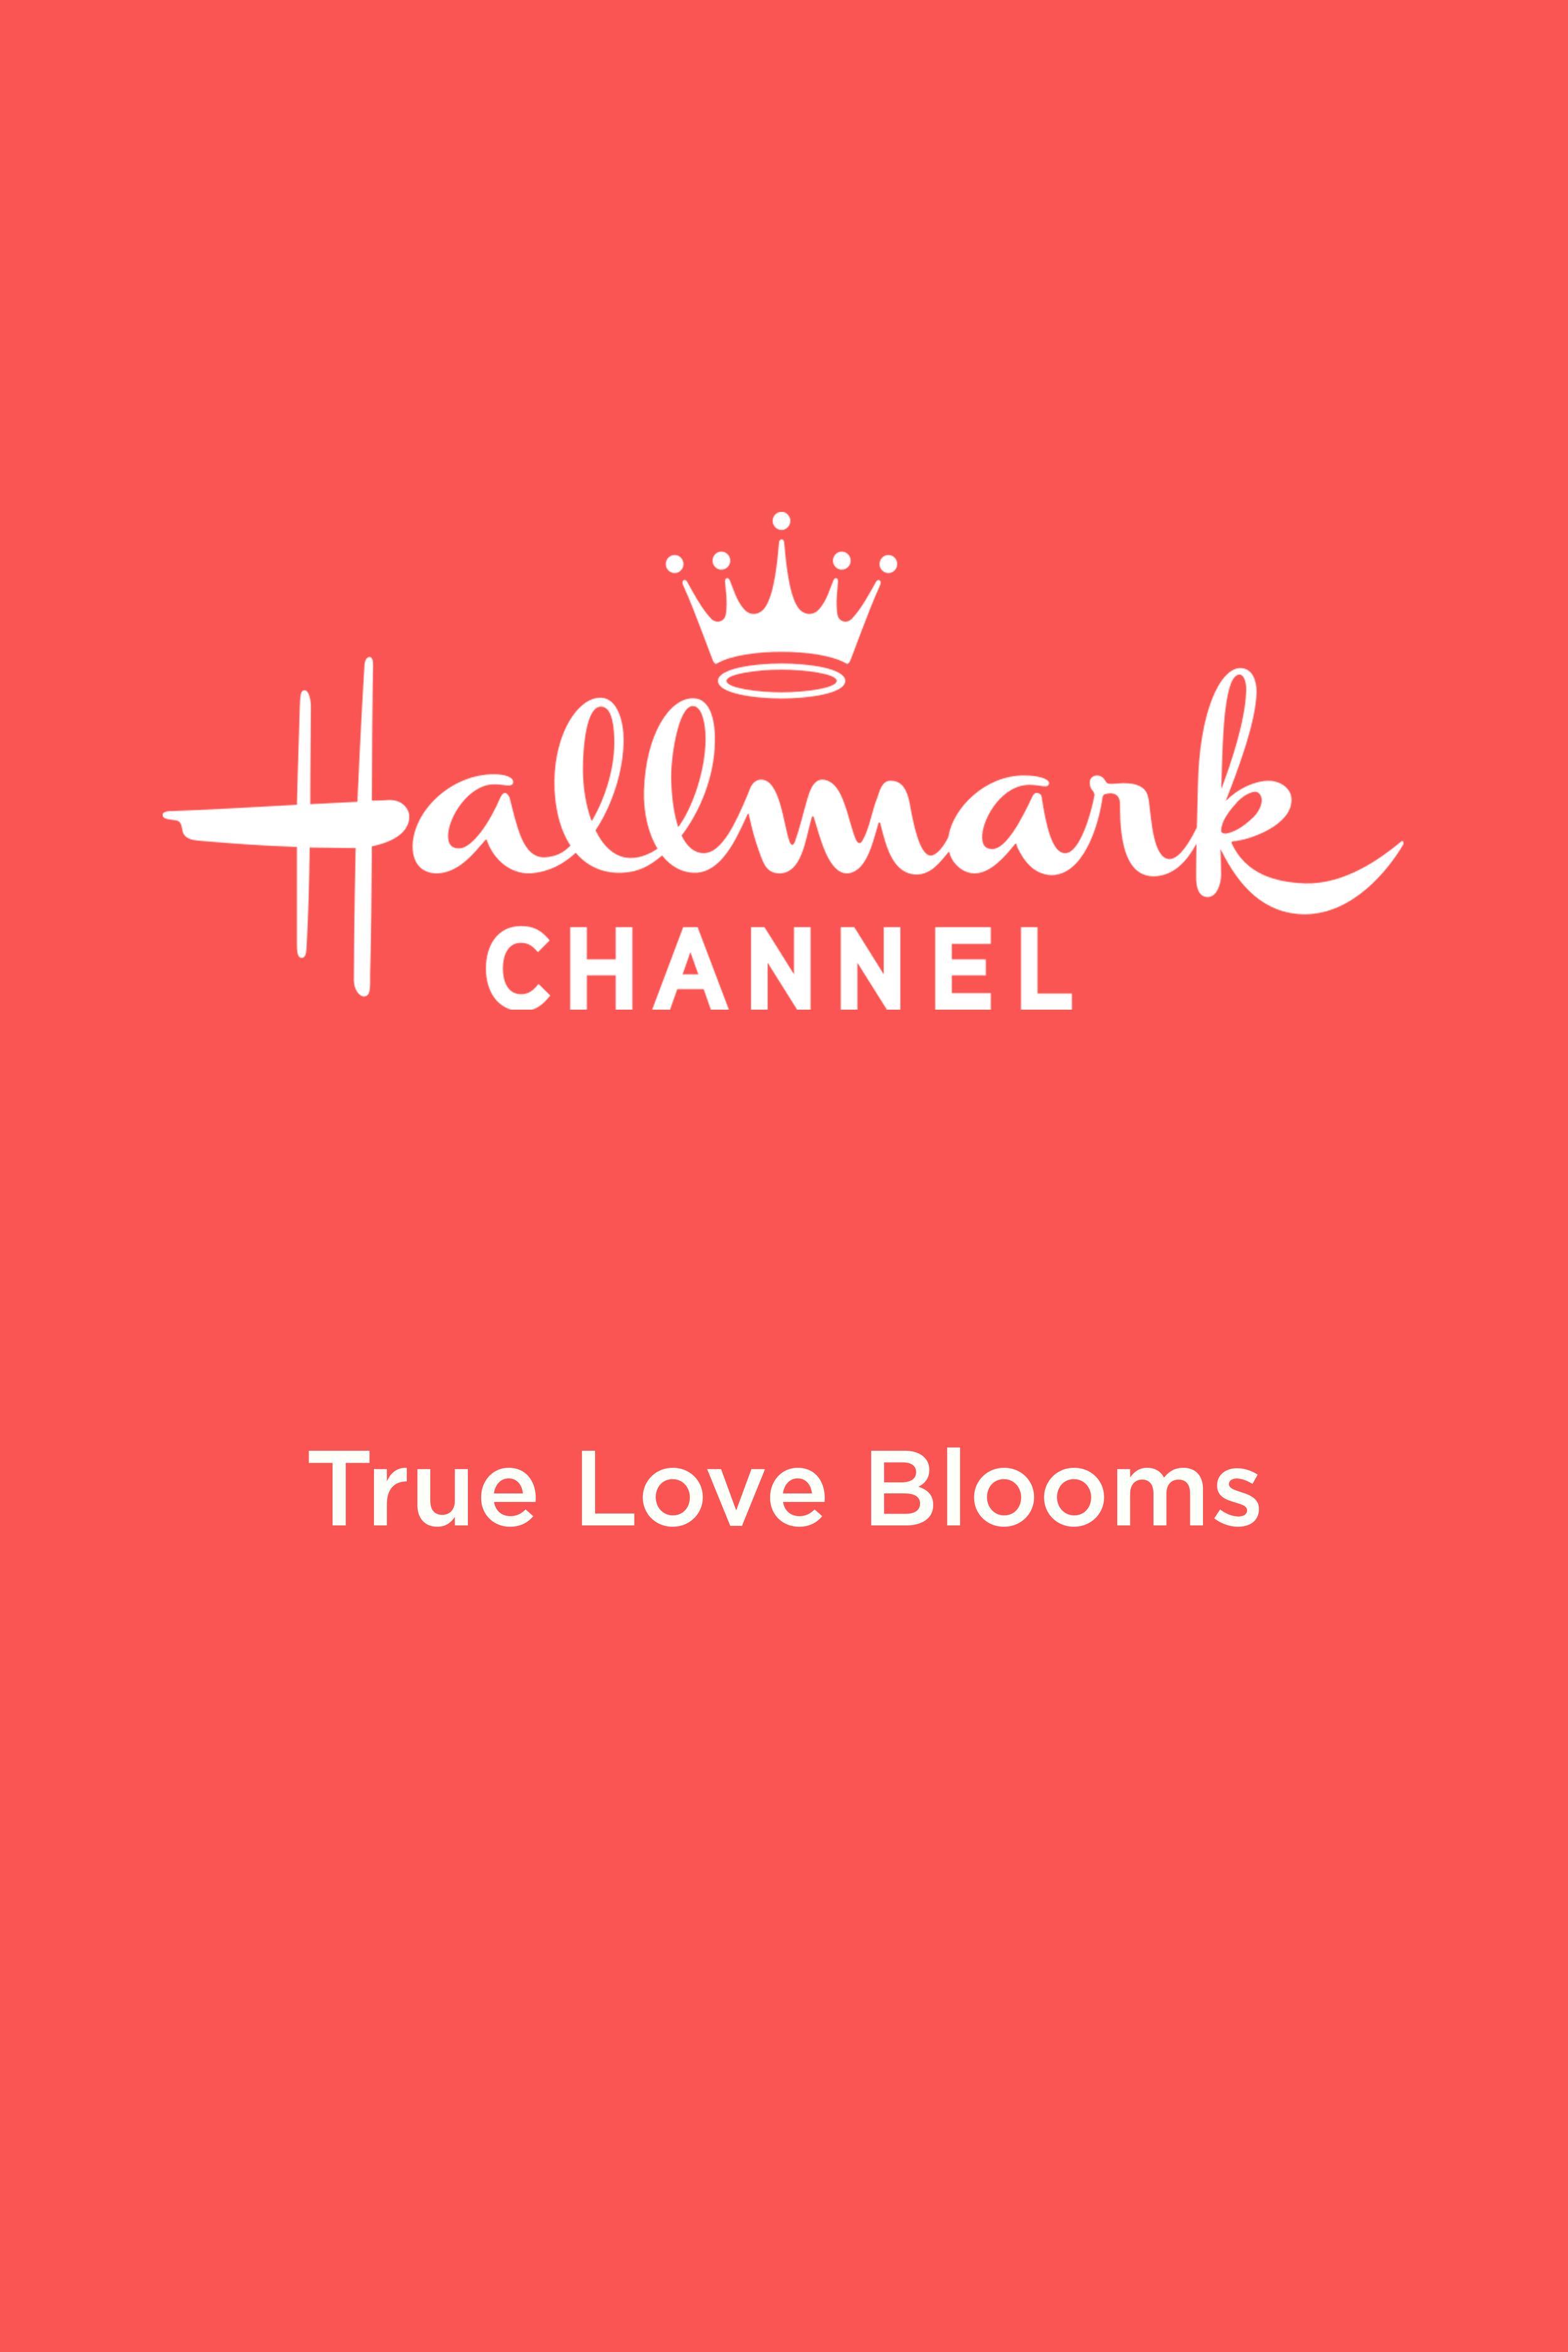 True Love Blooms.png